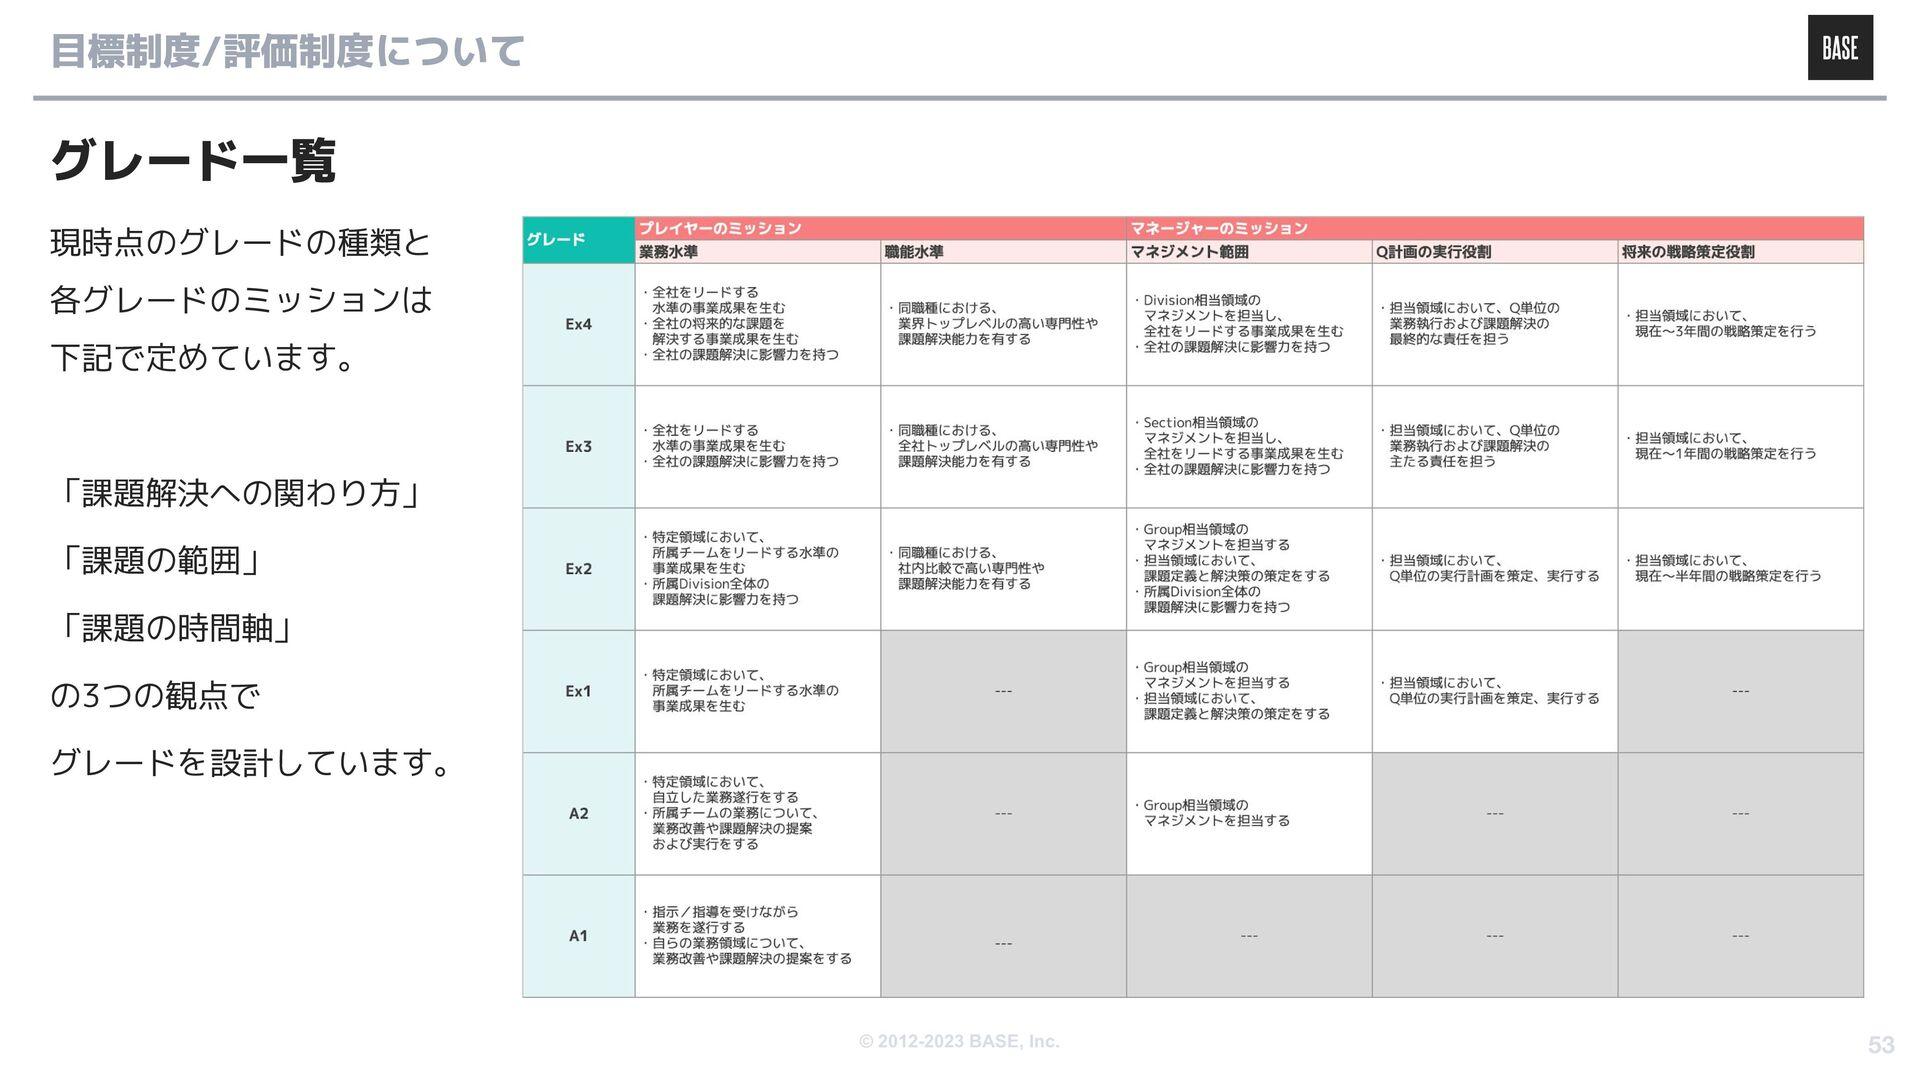 © 2012-2020 BASE, Inc. 沿革